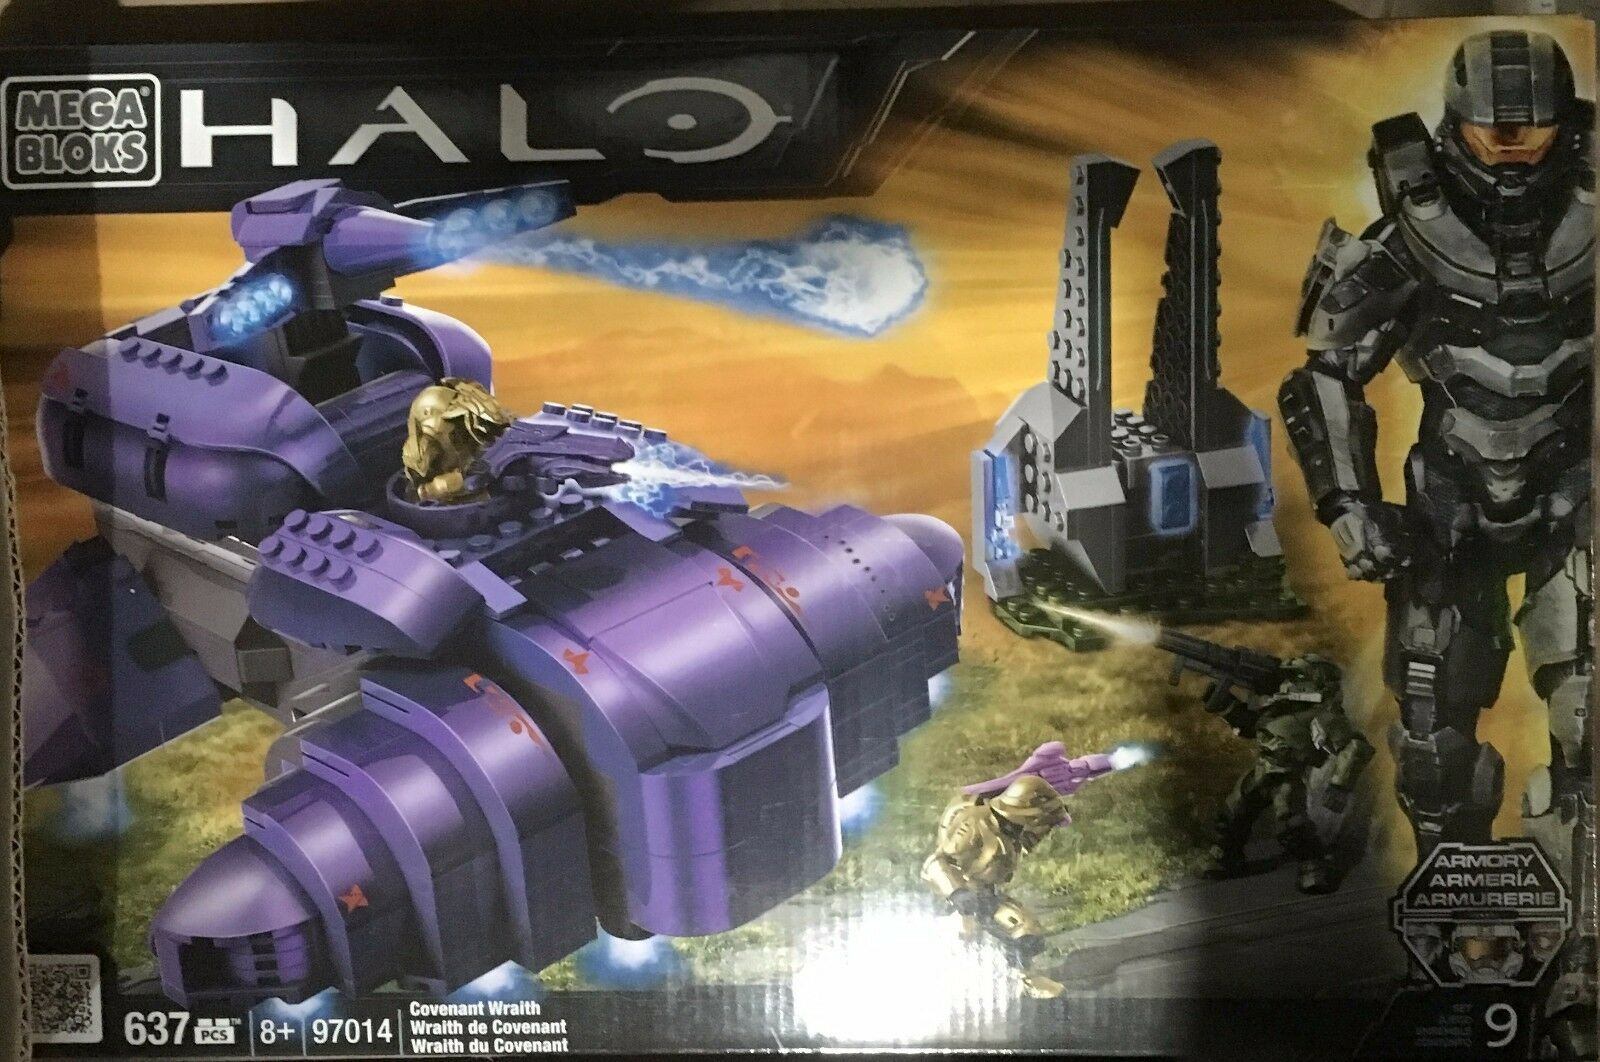 NEW Mega Bloks Halo Covenant Wraith Building Set 97014